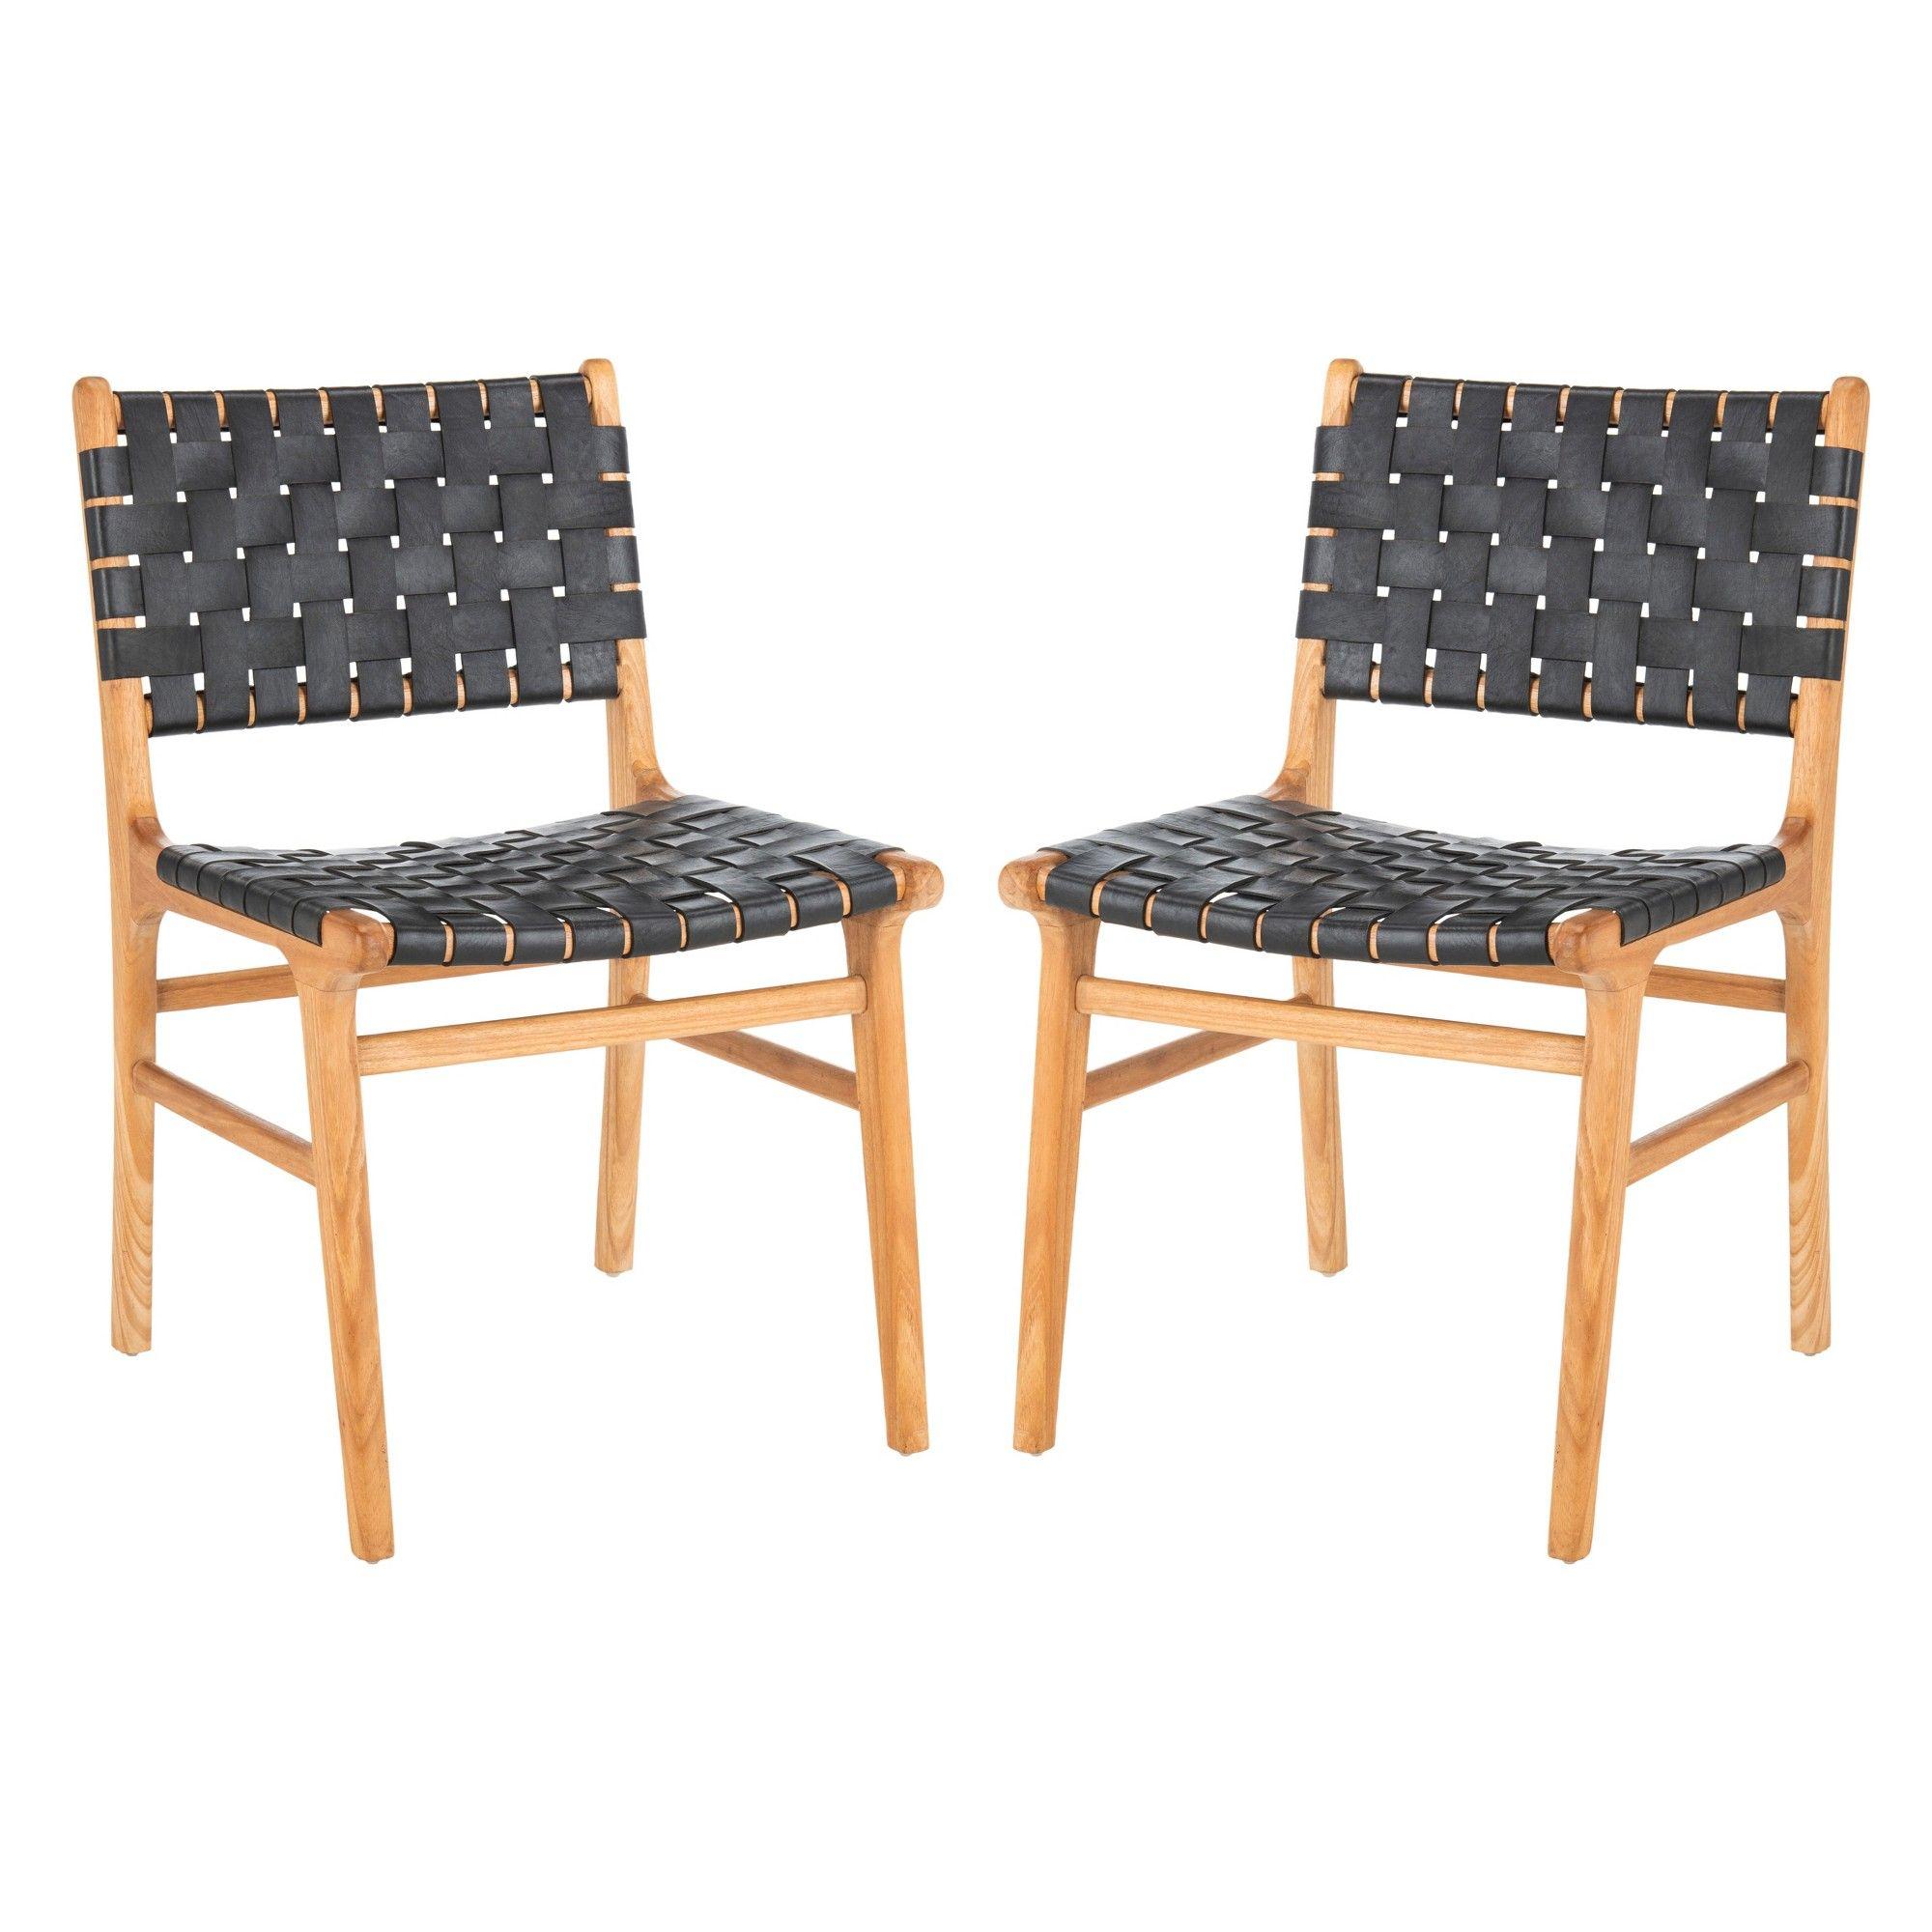 Sensational Set Of 2 Taika Woven Leather Dining Chair Black Safavieh Theyellowbook Wood Chair Design Ideas Theyellowbookinfo